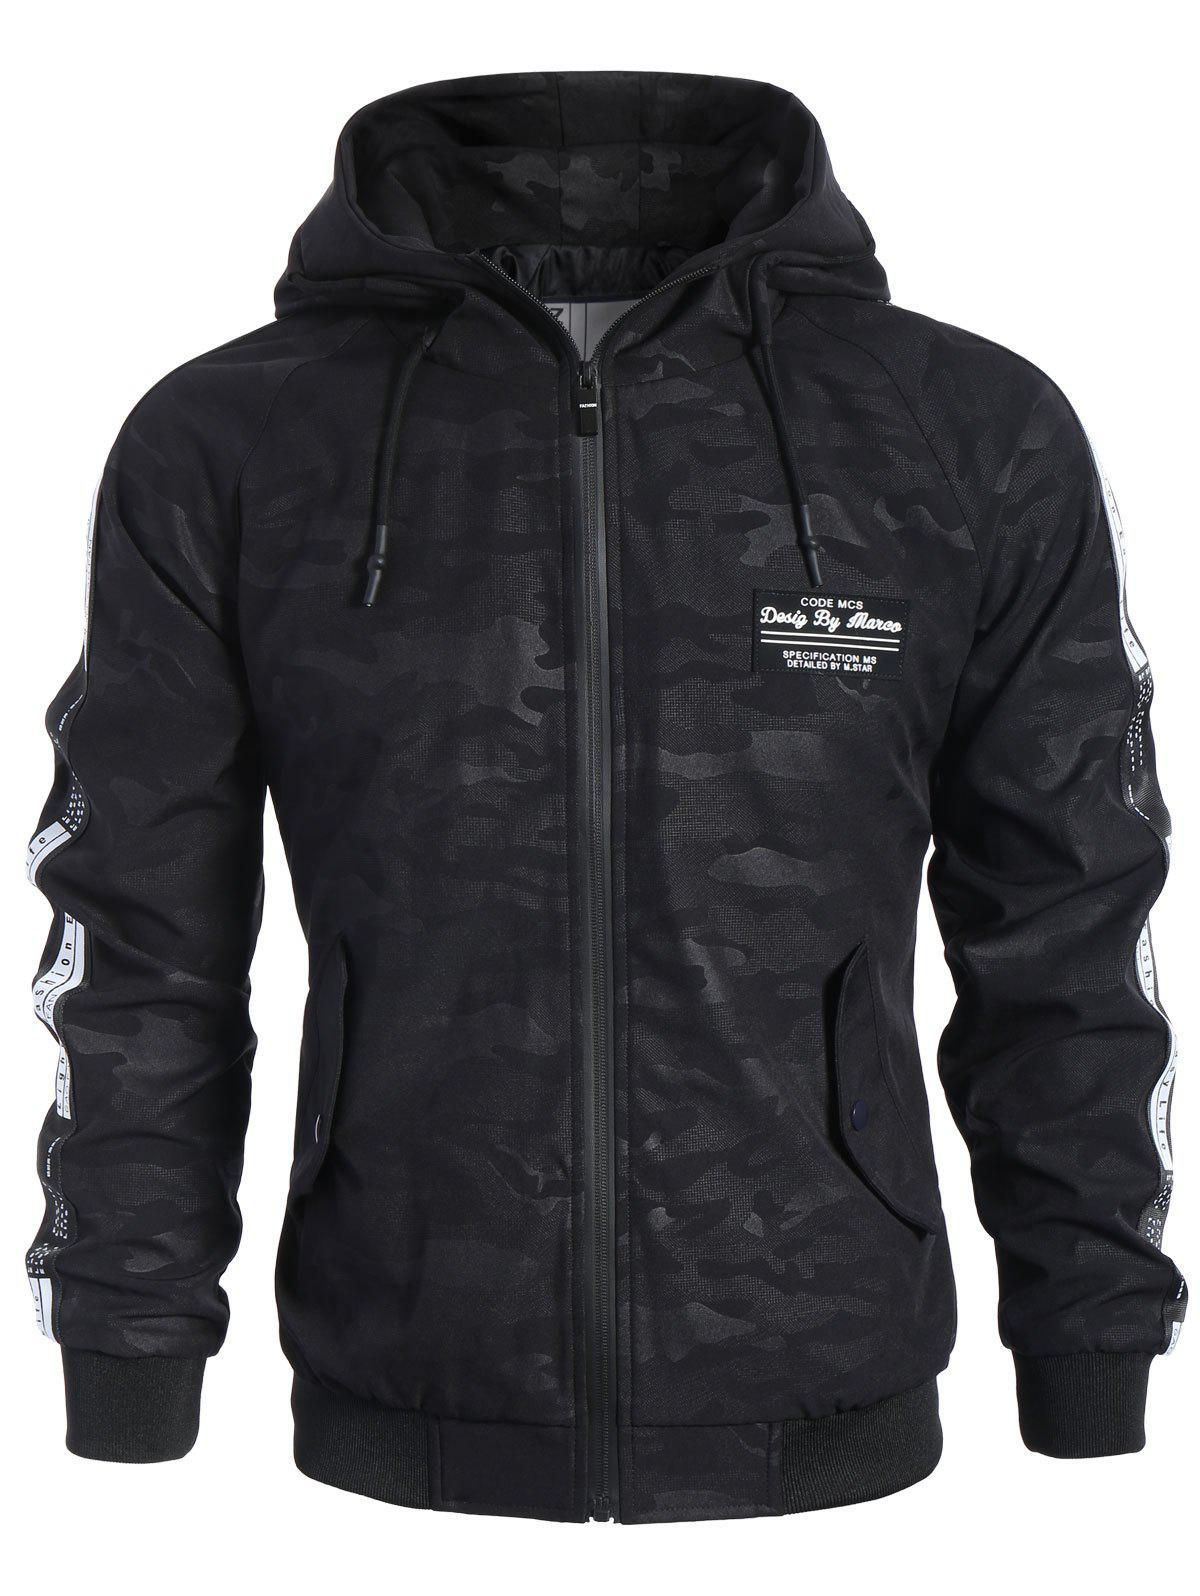 Side Letter Print Camo Hooded Jacket 221805301